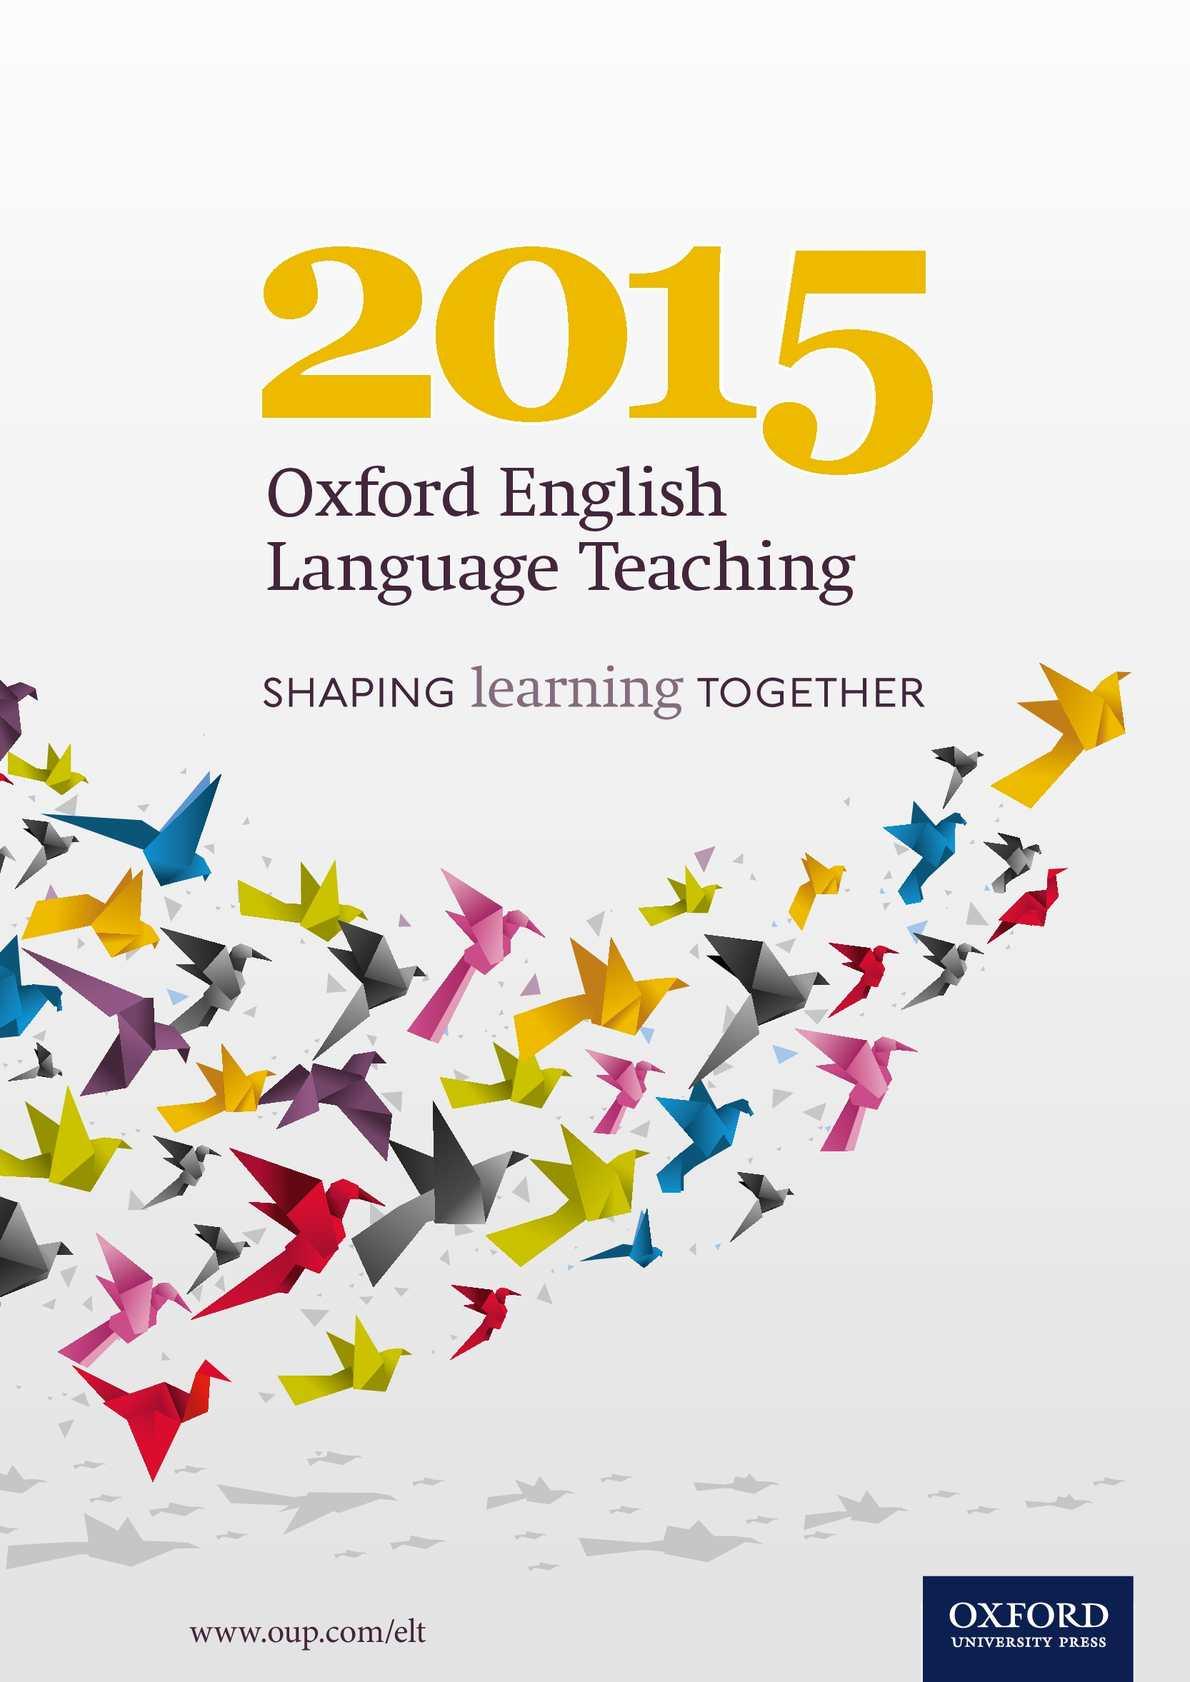 Calaméo - Catálogo ELT Oxford 2015